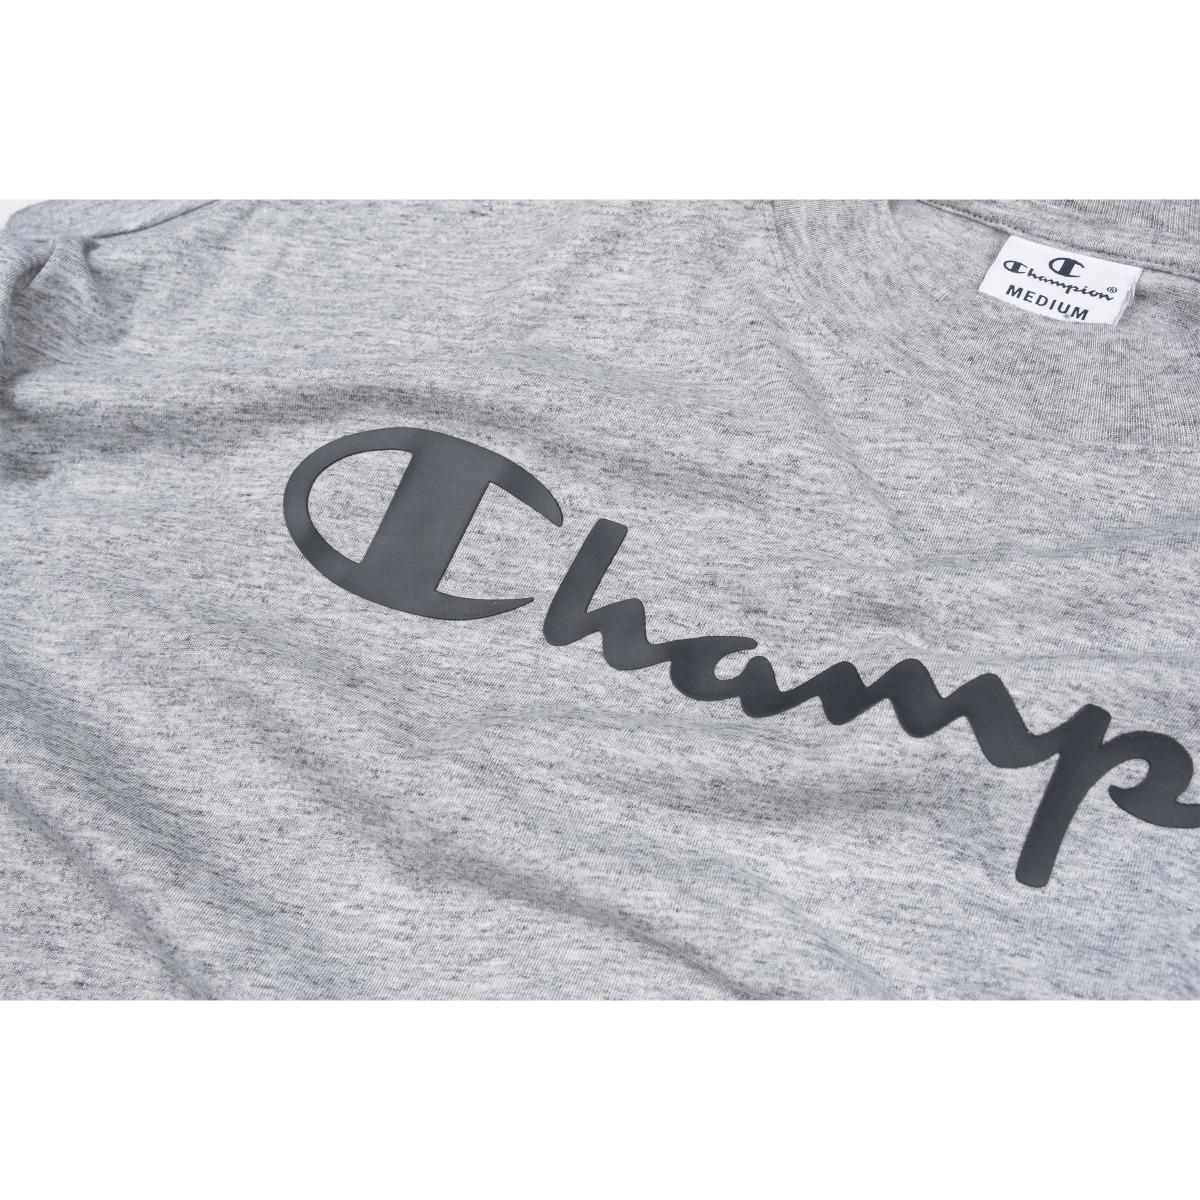 Champion Damen Crop Top T-Shirt 113227